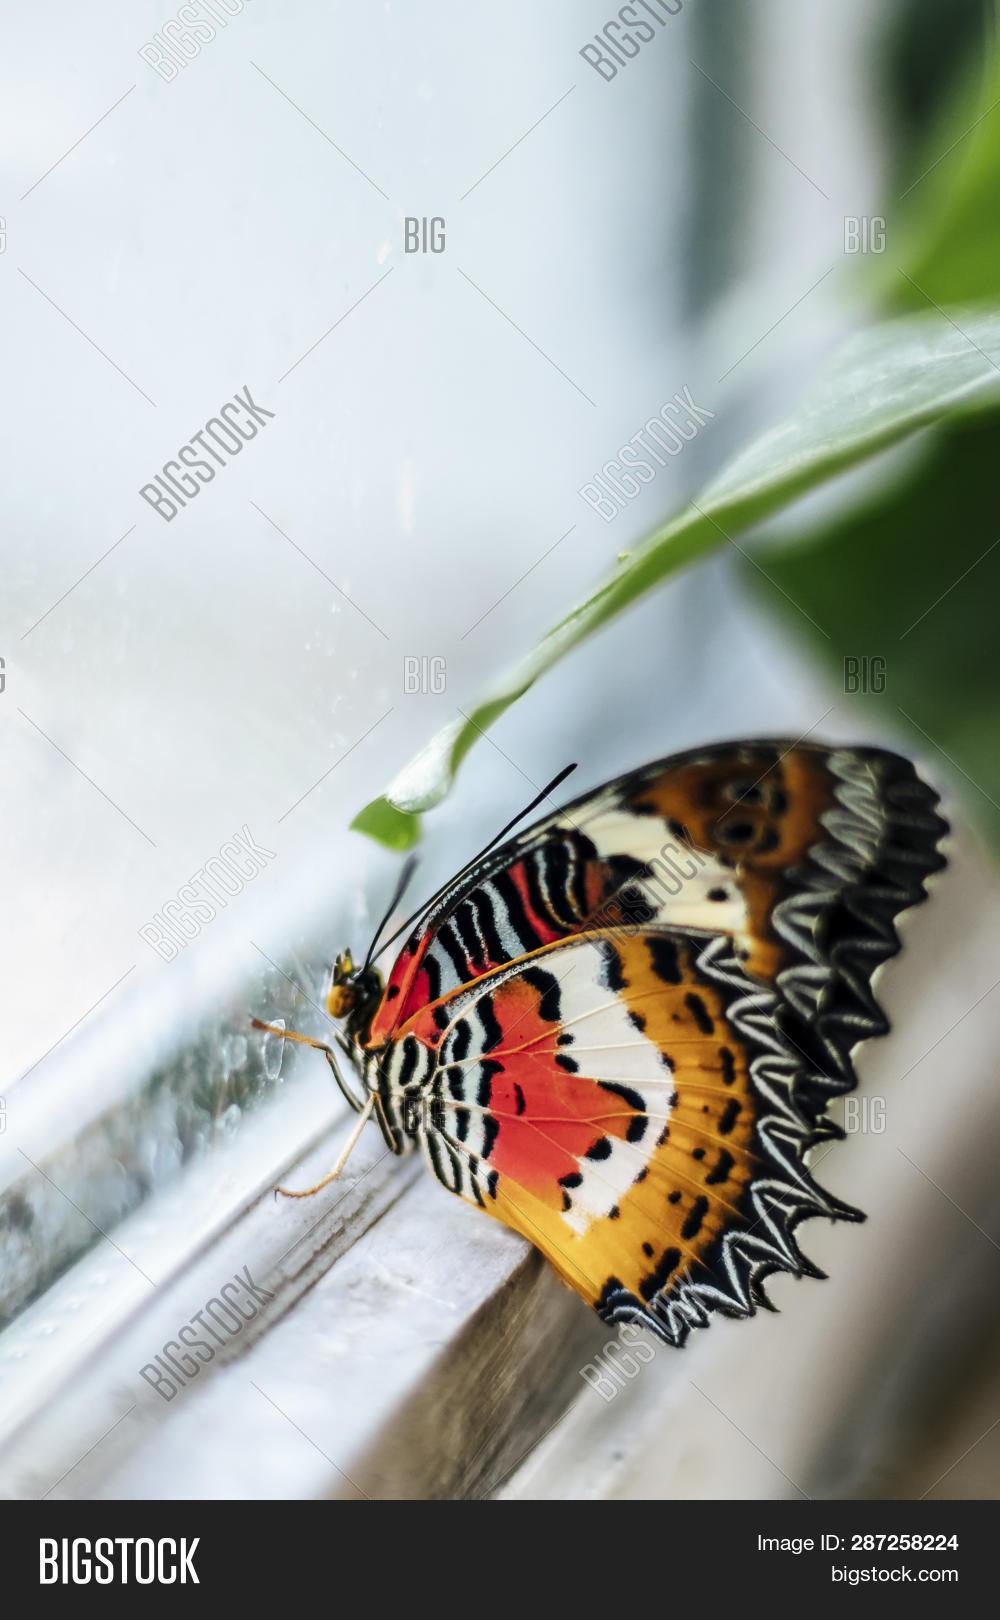 Close Nemo, Clown Fish Image & Photo (Free Trial) | Bigstock